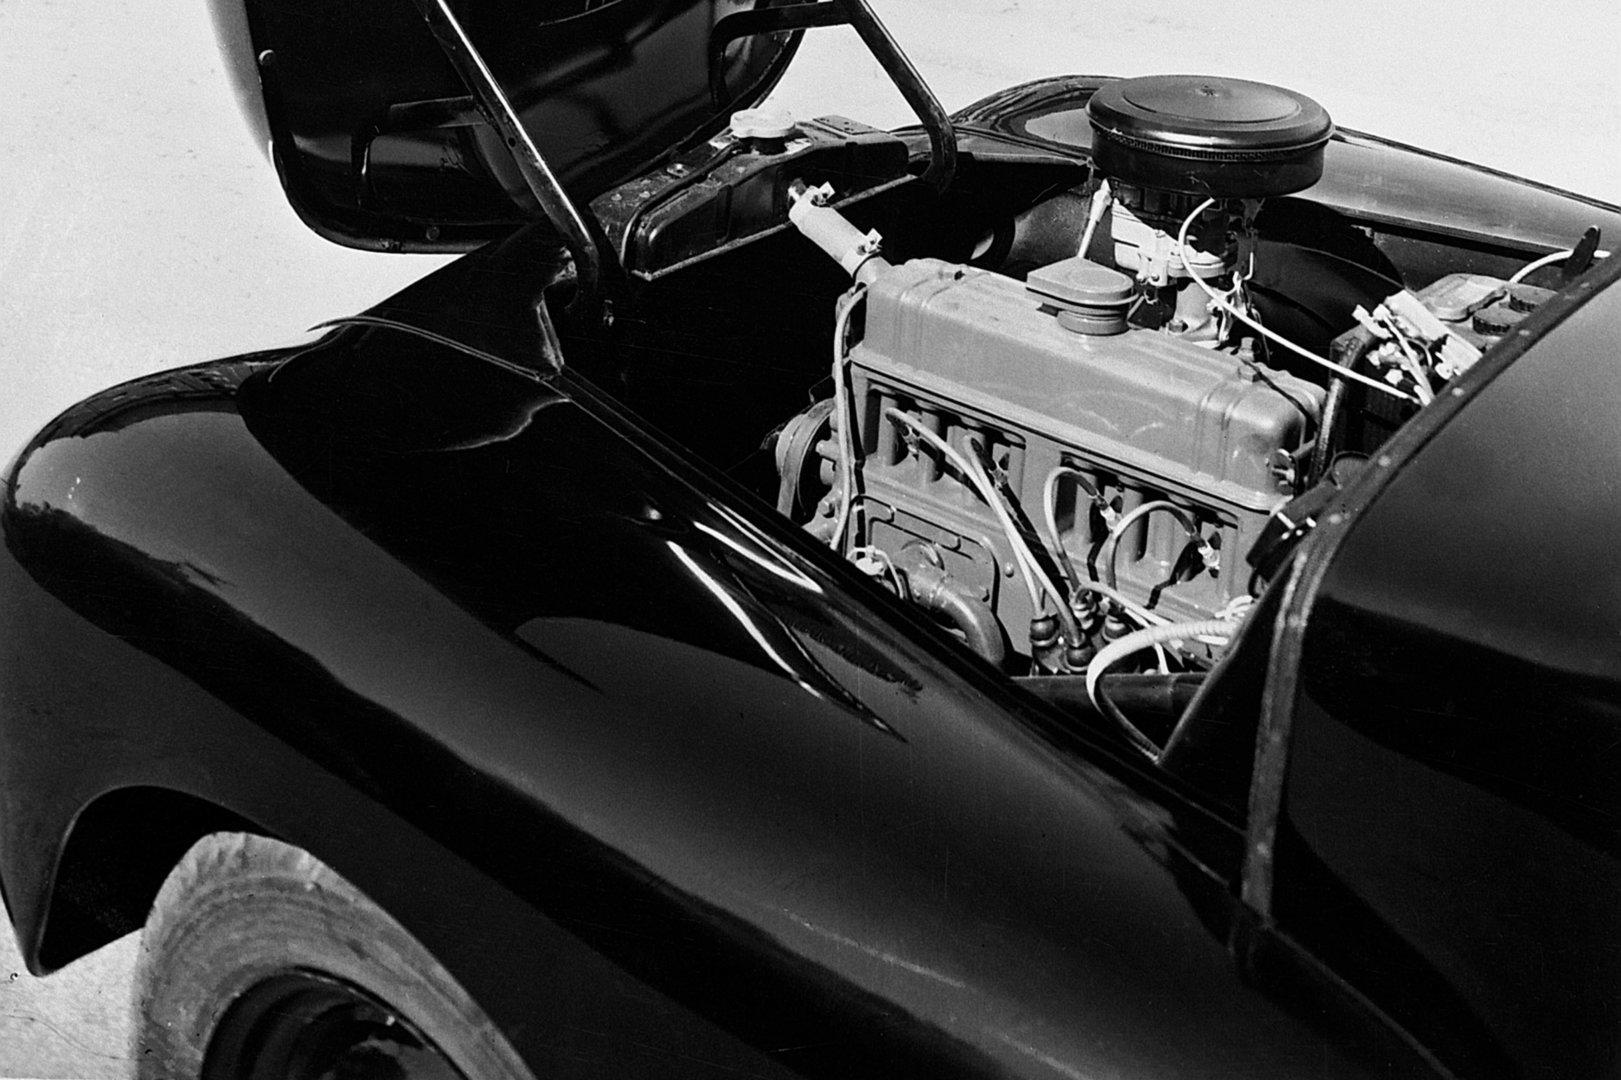 Volvo PV 444 motor B4B